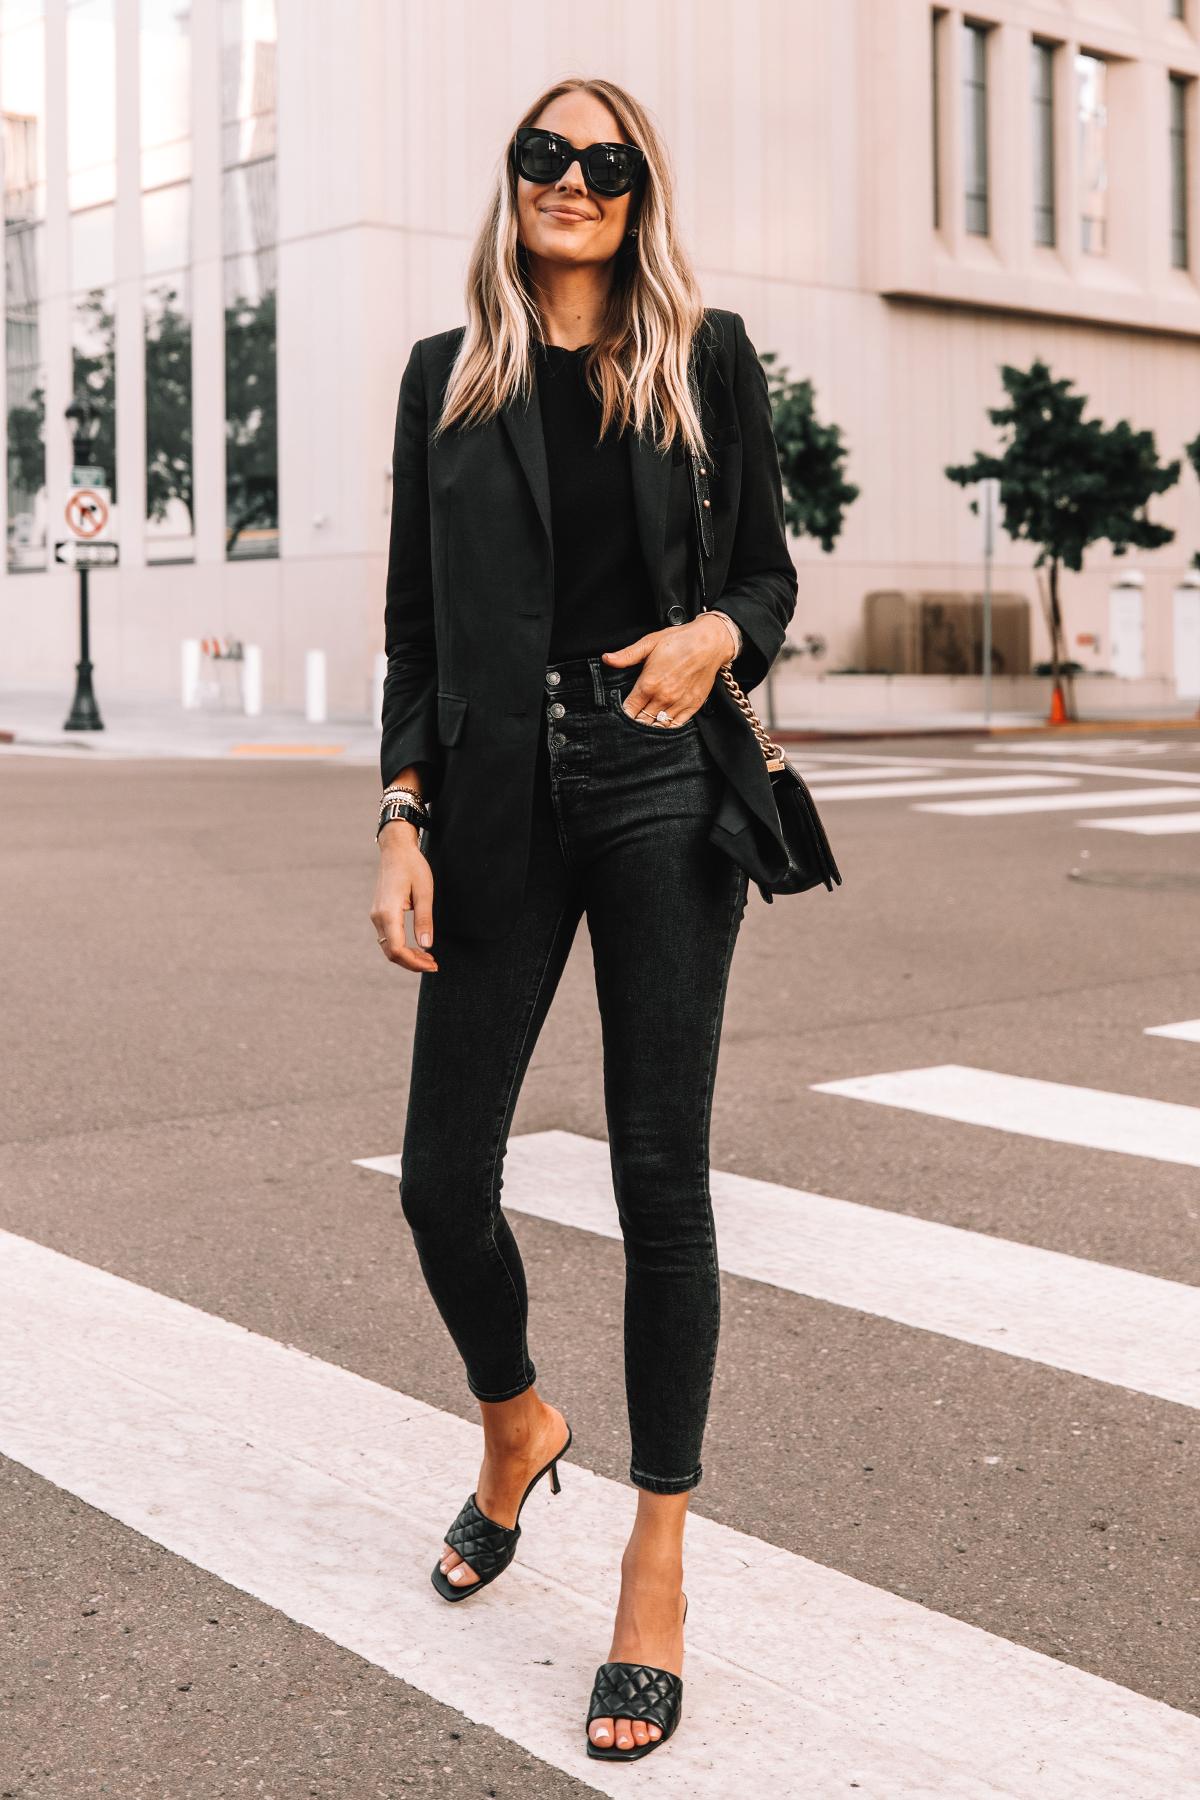 Fashion Jackson Wearing Everlane Black Blazer Everlane Black Skinny Jeans Black Heeled Sandals 3